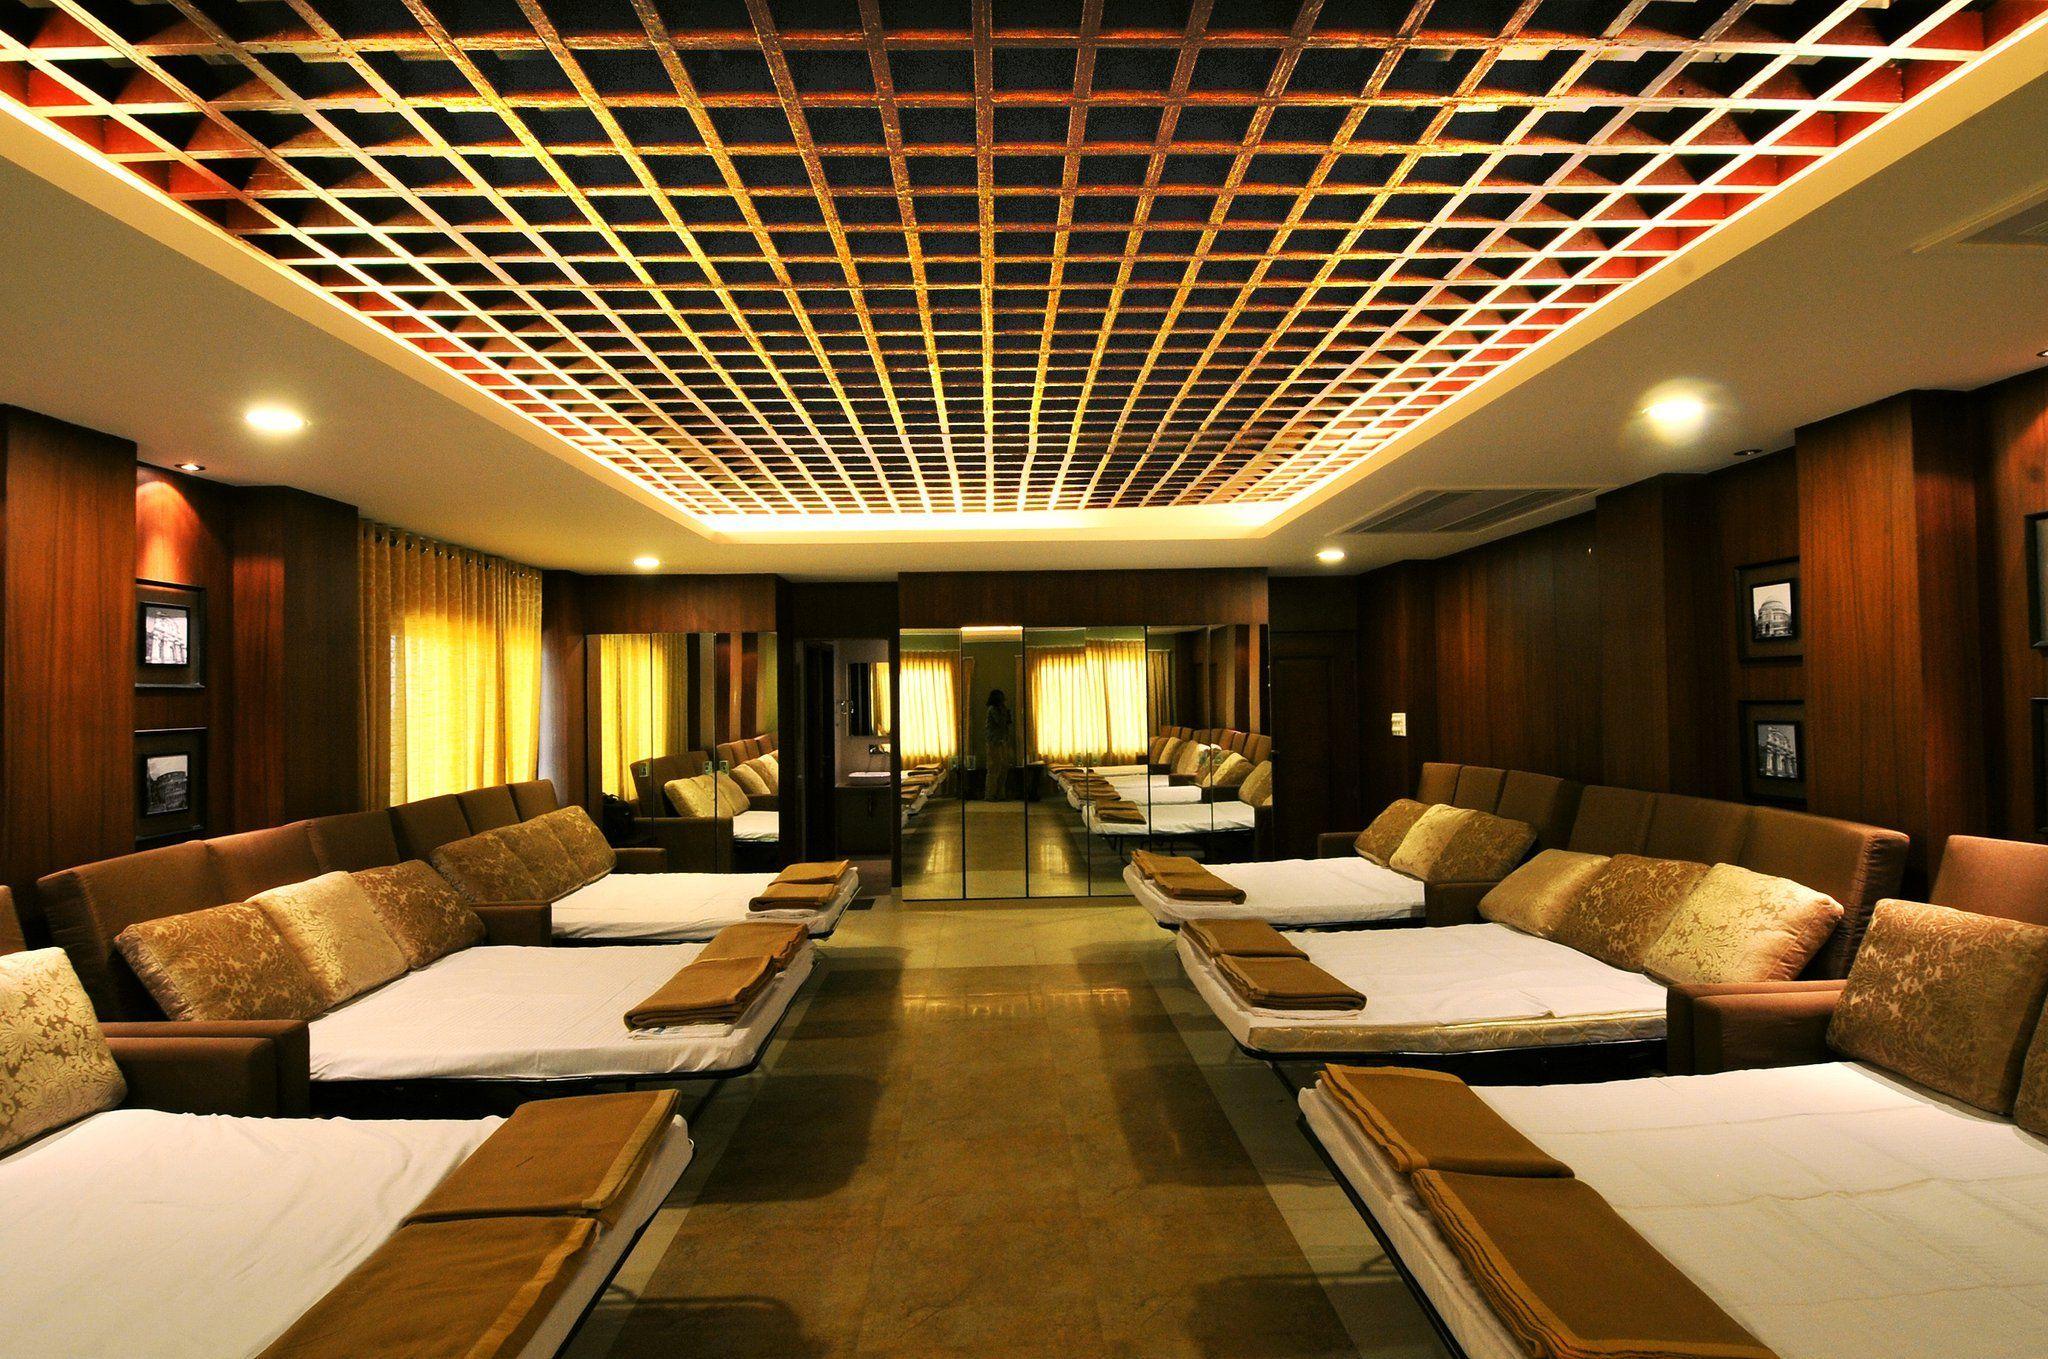 Hotel Interior design Ideas | Great Ideas | Pinterest